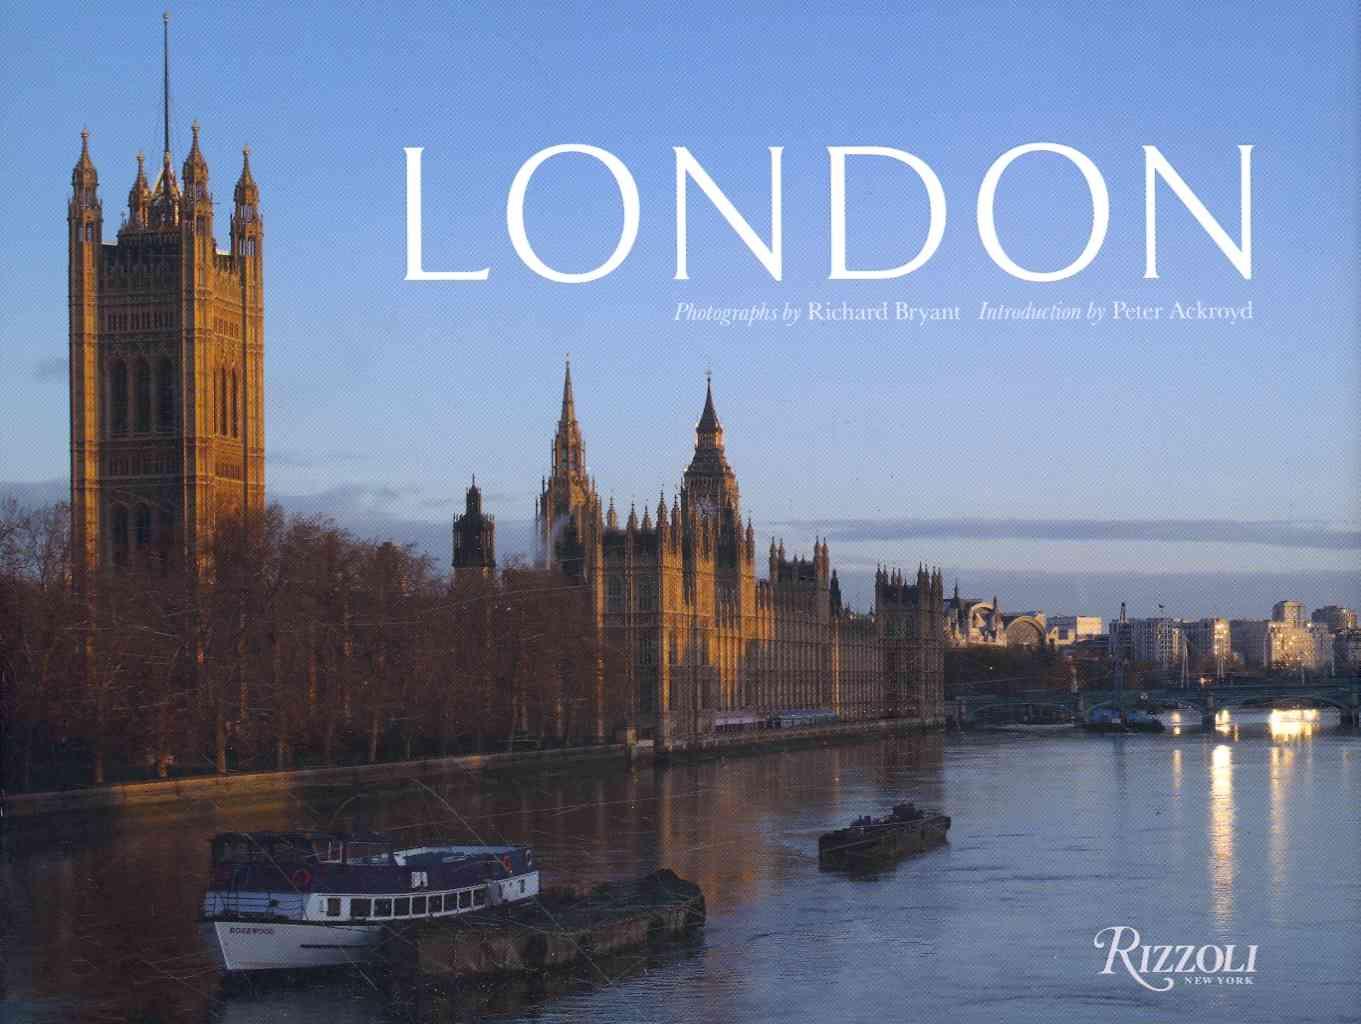 London (Hardcover)